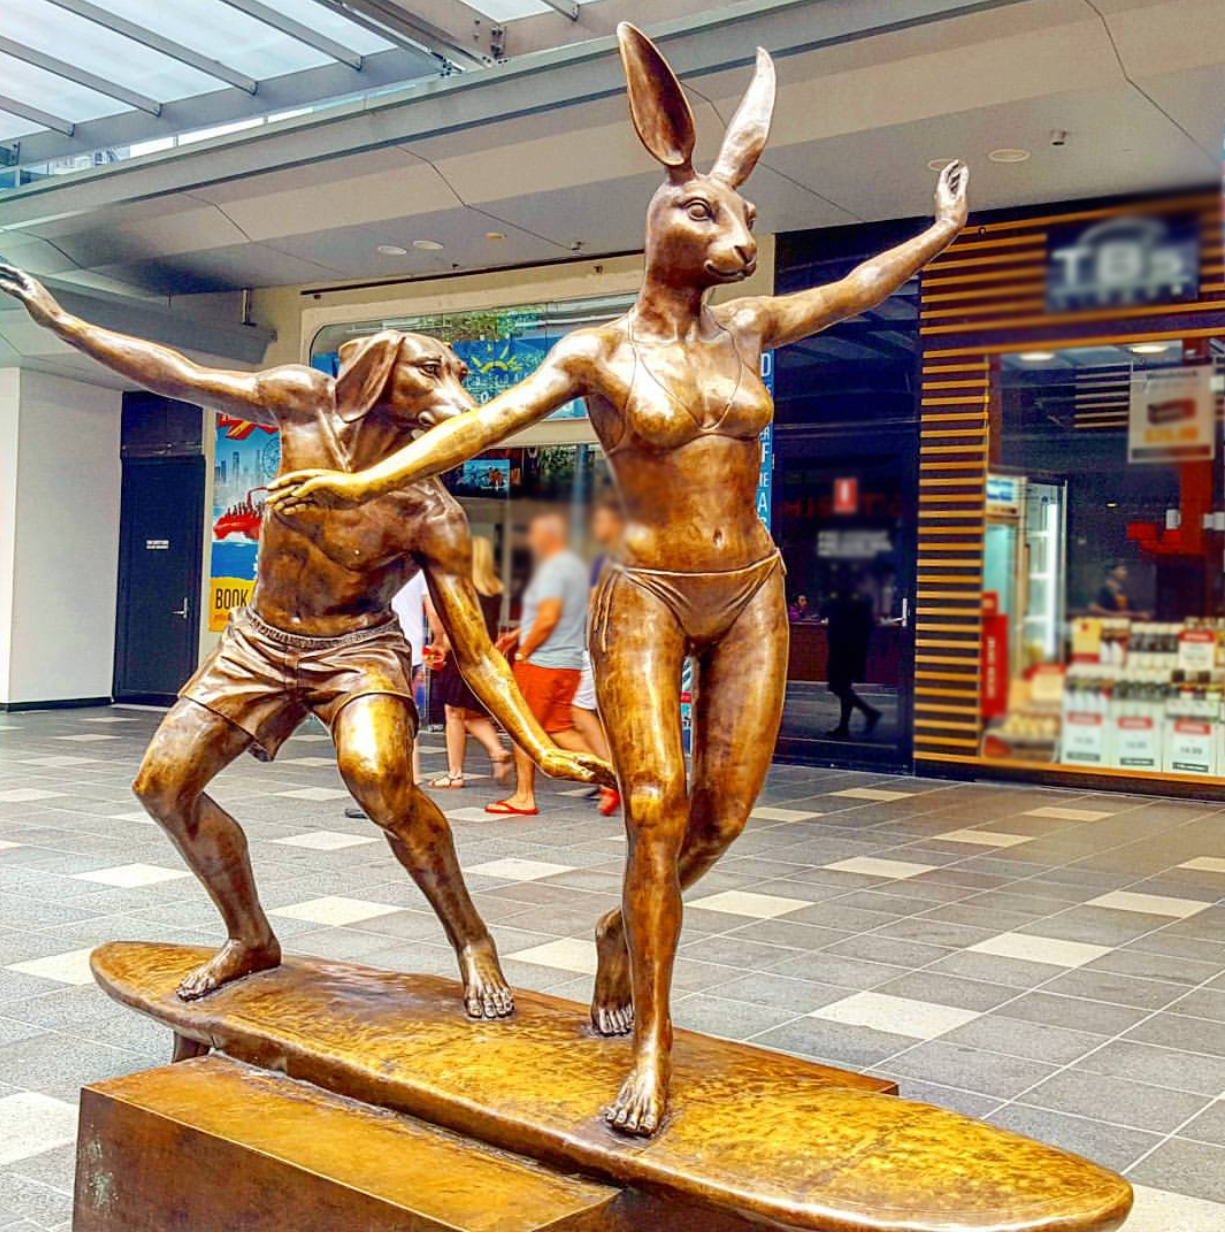 Dancing rabbit and dog bronze statue